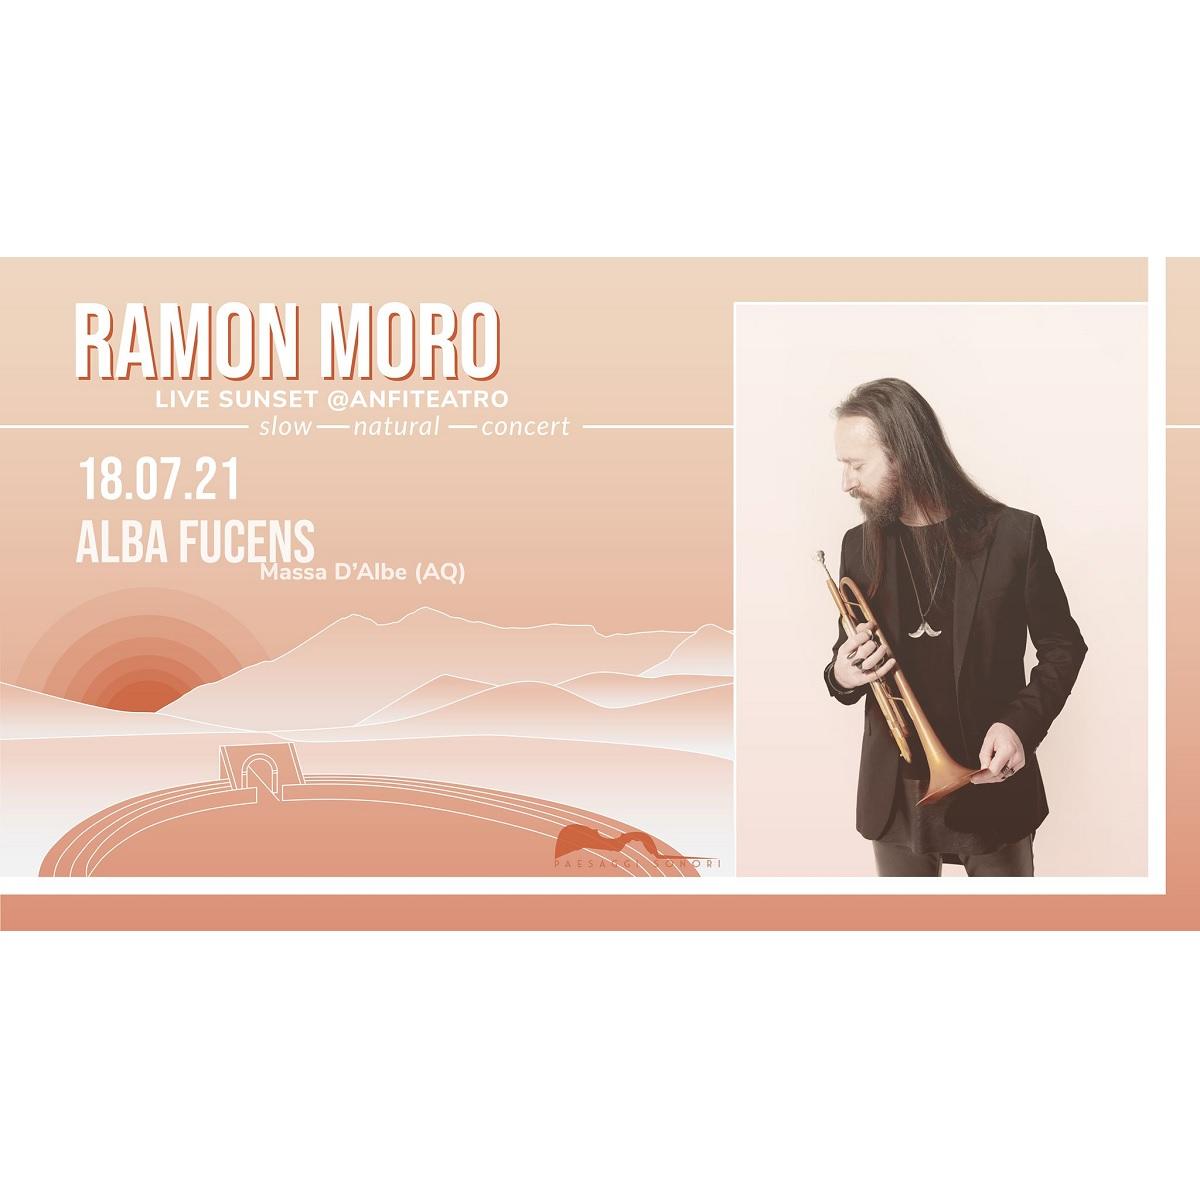 Ramon Moro live sunset presso Rovine Romane Alba Fucens foto